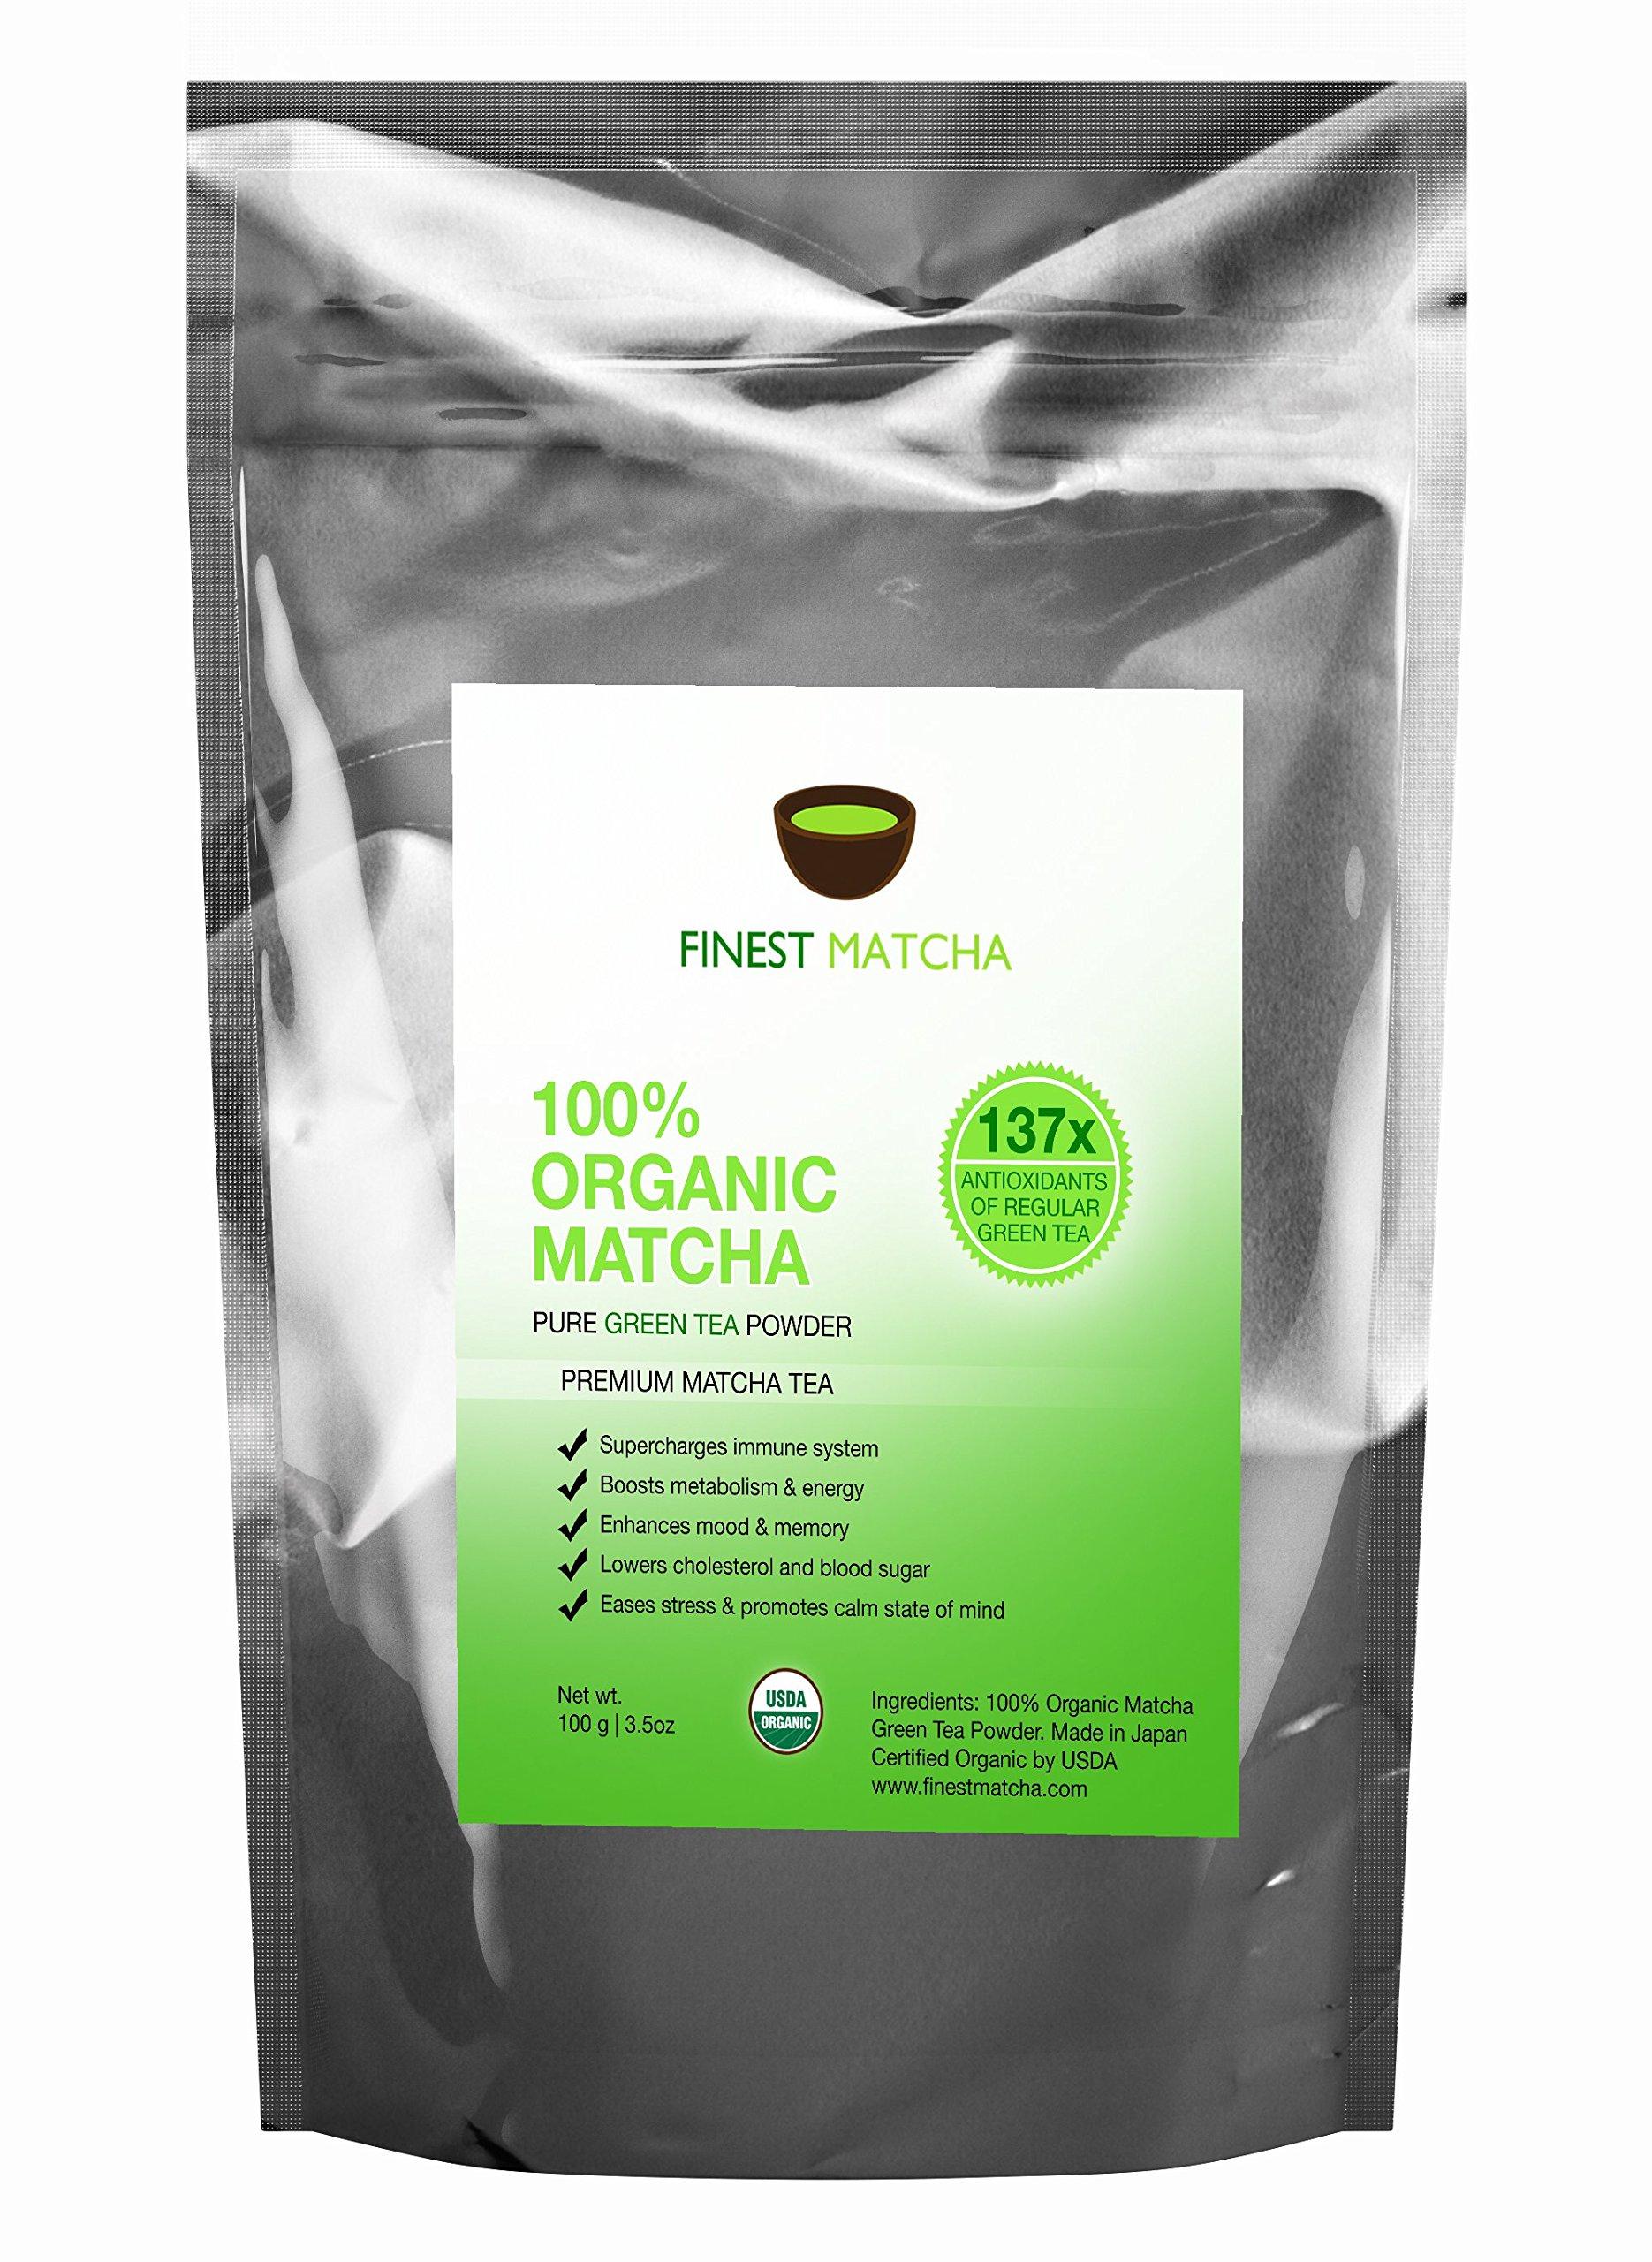 Matcha Green Tea Powder, 100% Organic Japanese Premium Matcha - Fat Burner, Energy Booster, 137 x Antioxidants, 100g